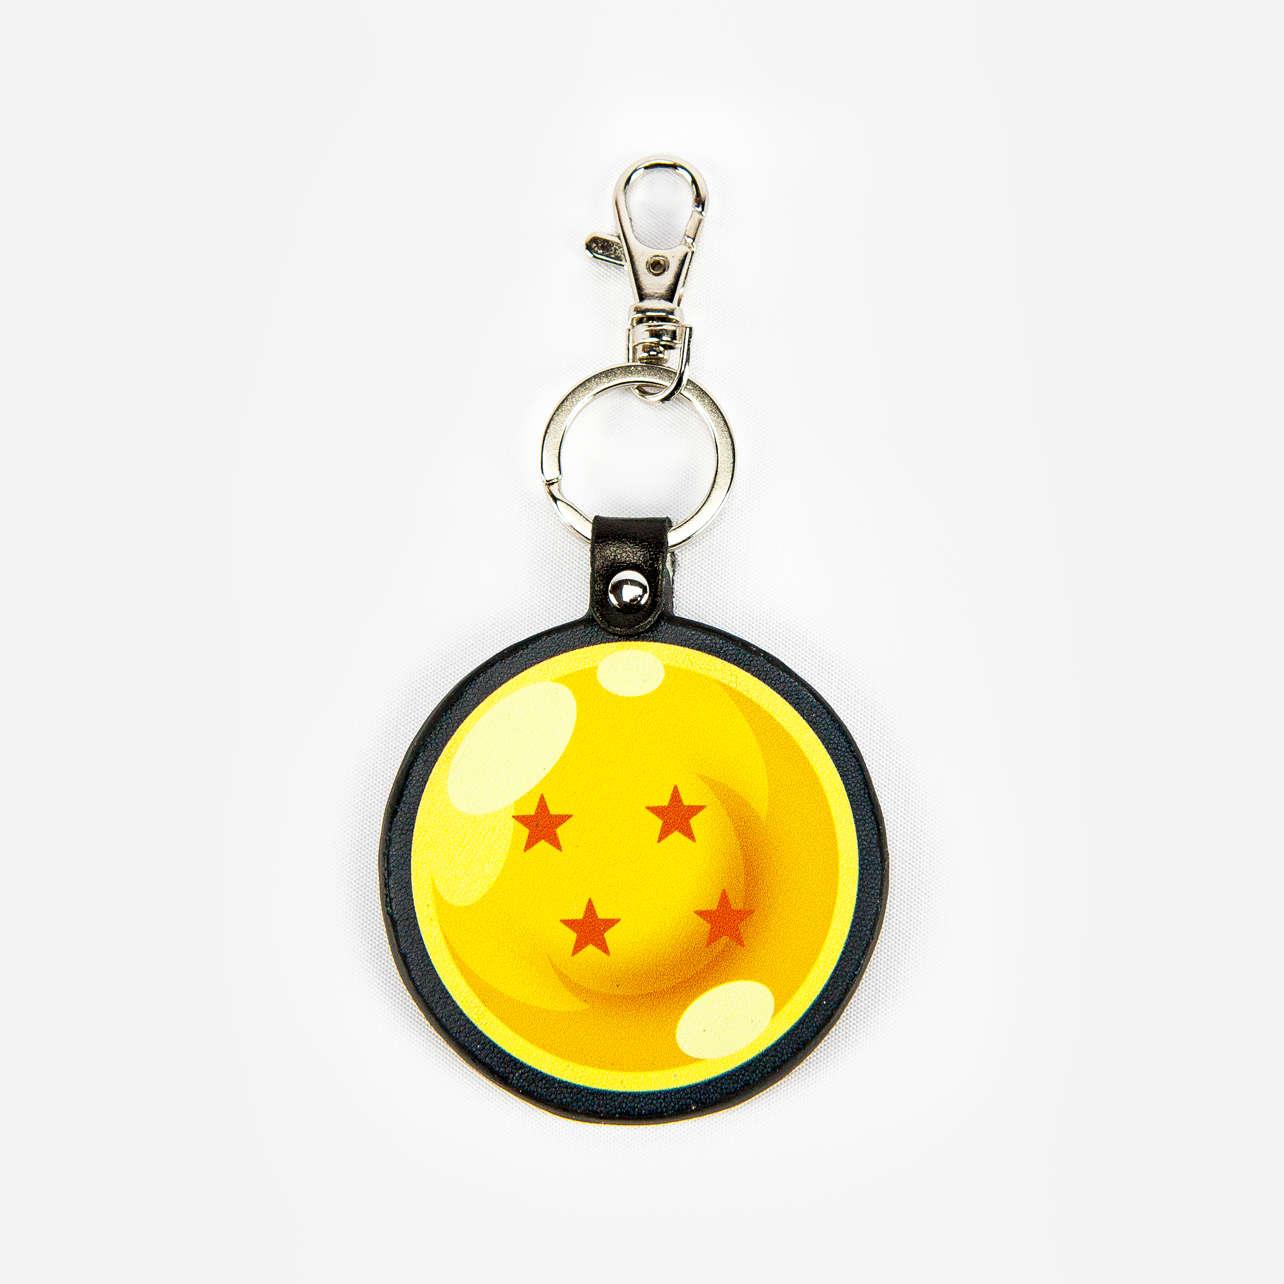 Dragonball Keychain accessories